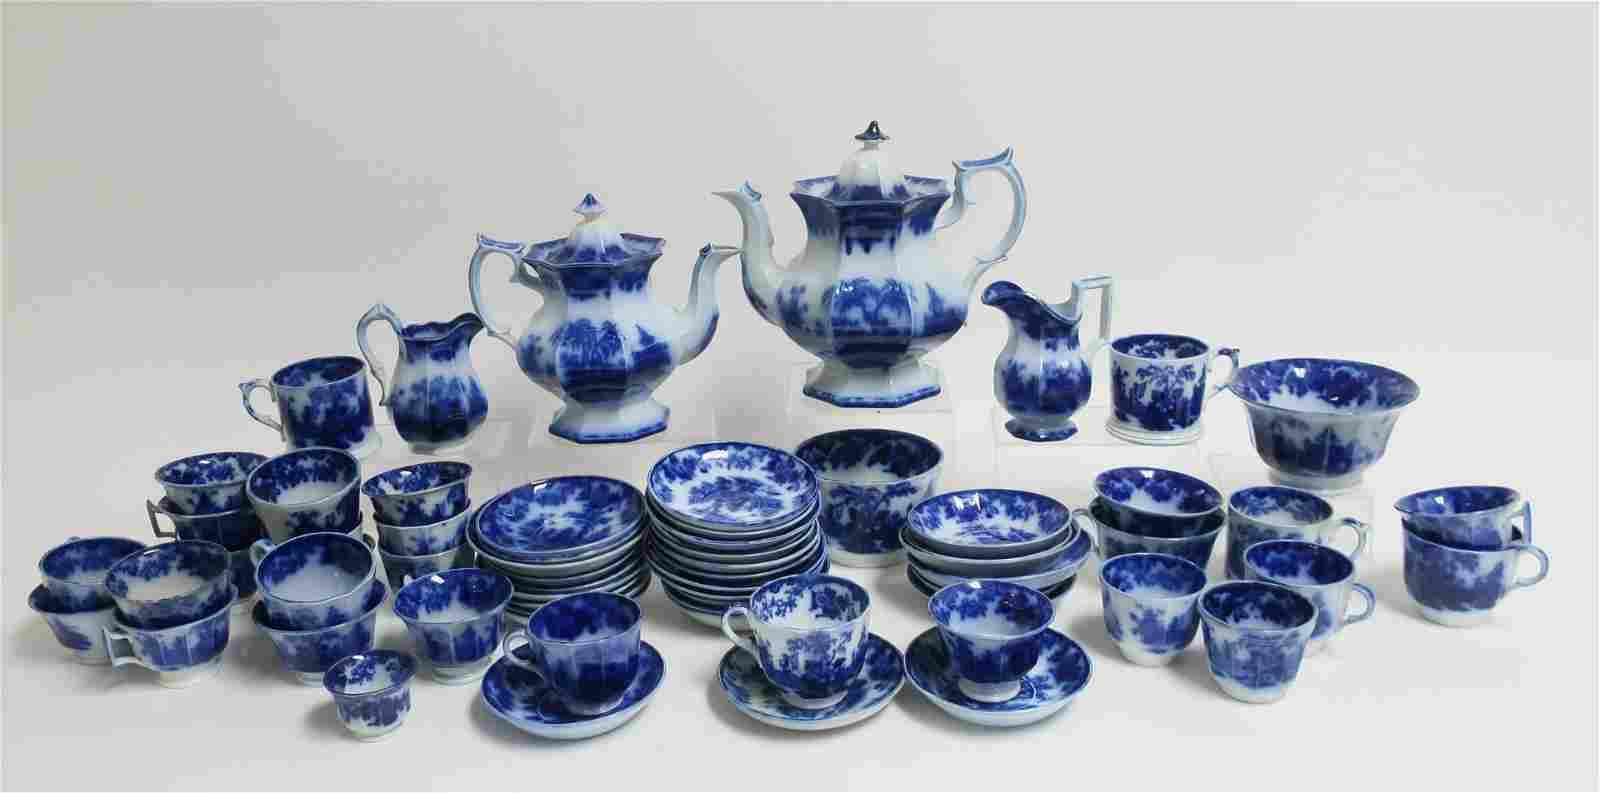 Flow Blue 'Scinde' Transferware Teawares, 19th C.